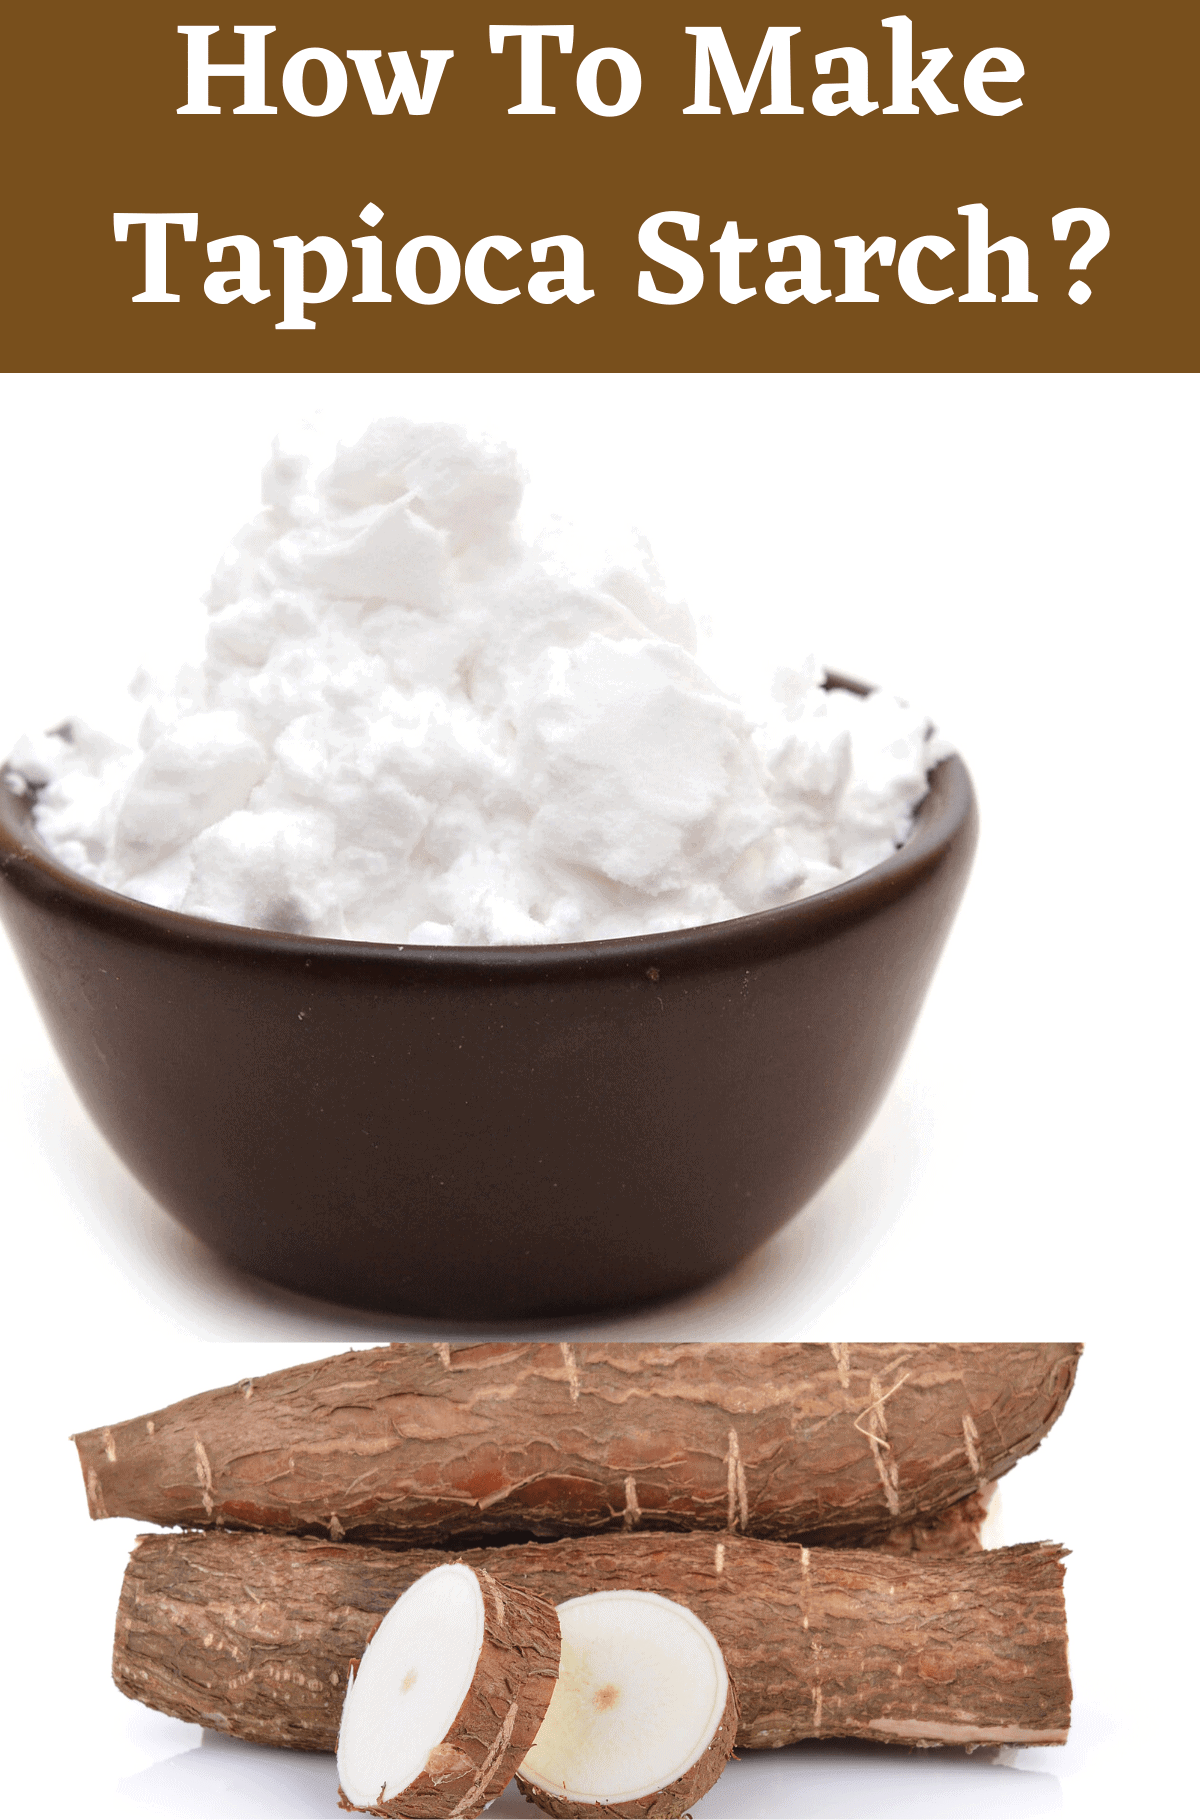 How To Make Tapioca Starch?